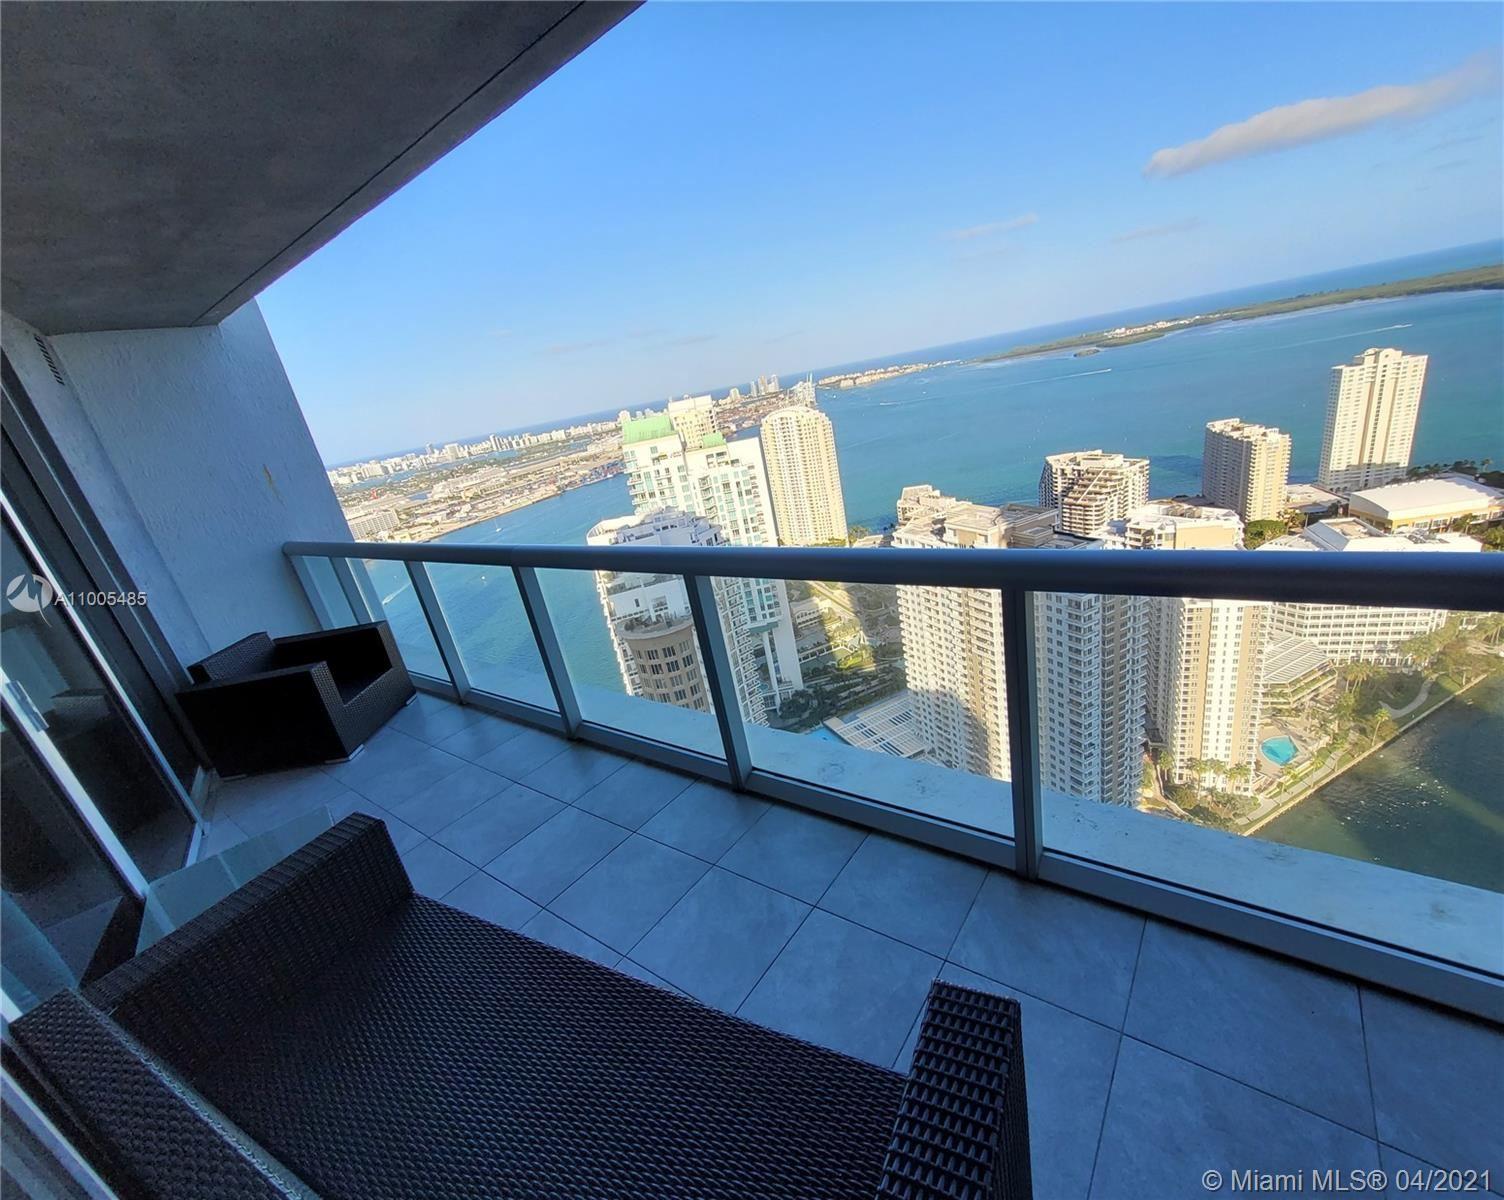 Photo of 465 Brickell Ave #4905, Miami, FL 33131 (MLS # A11005485)